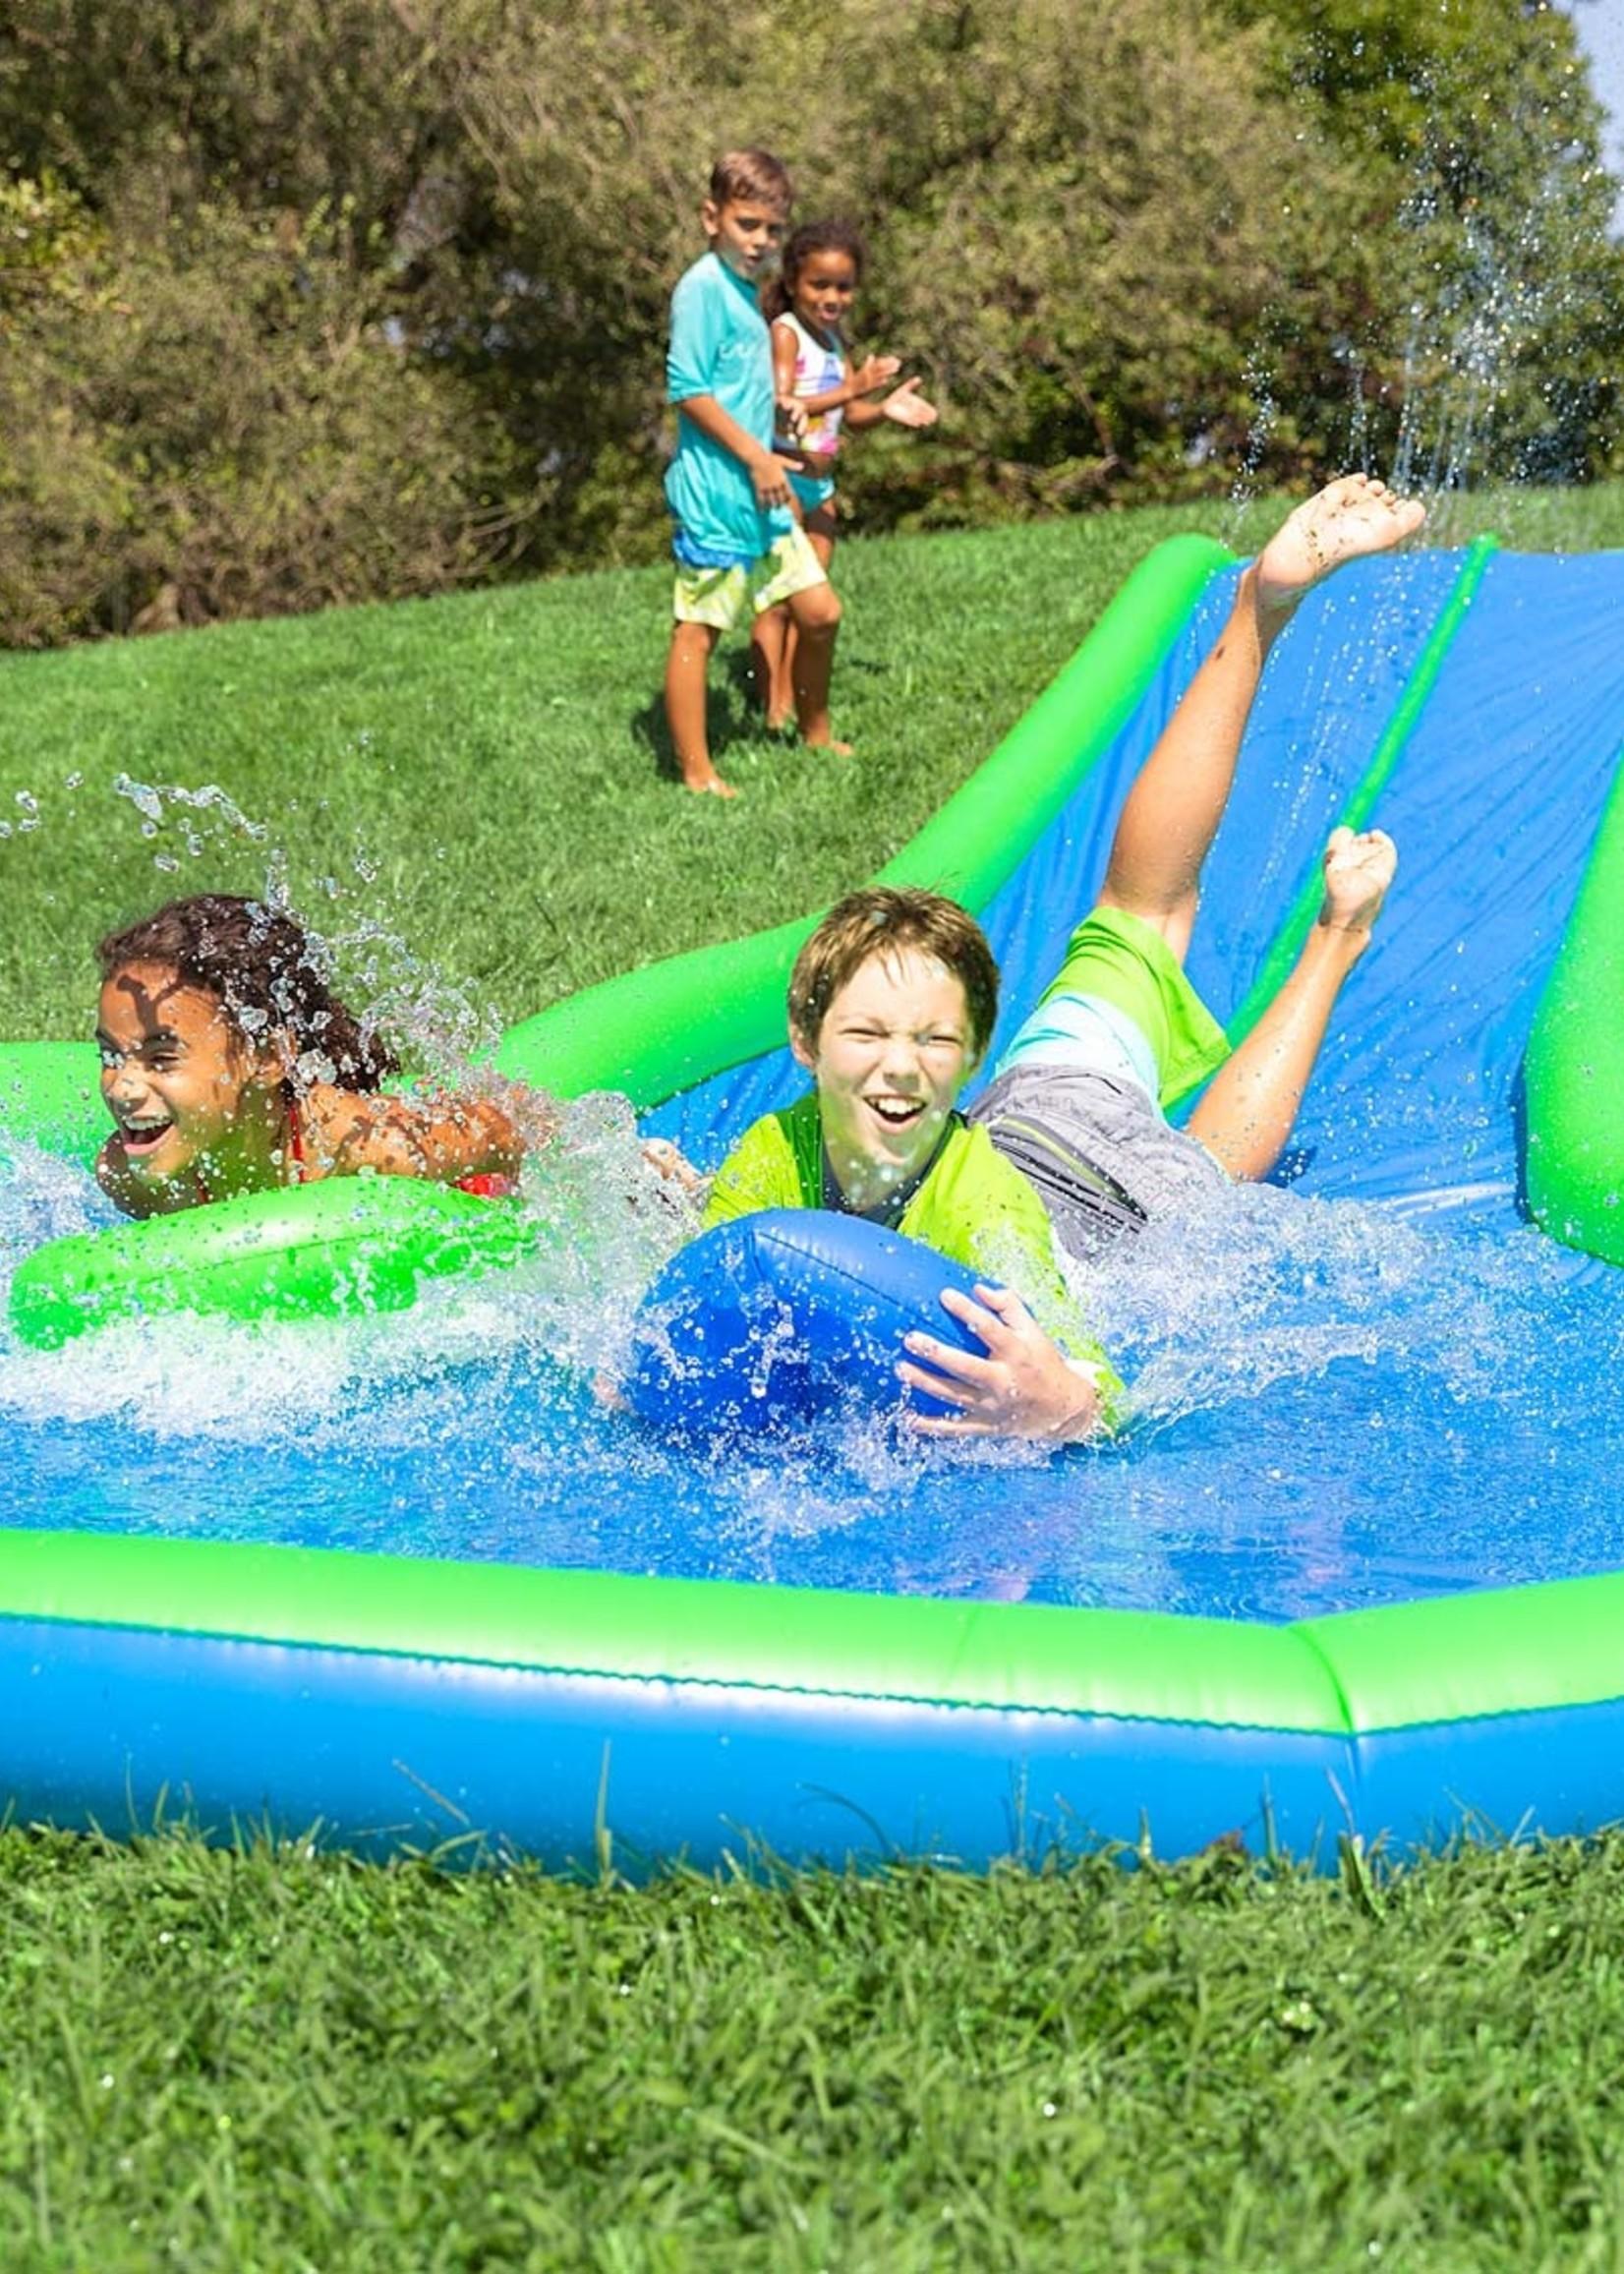 Hearthsong Ultimate Dual Water Slide Sprinkler with Two Speed Boards